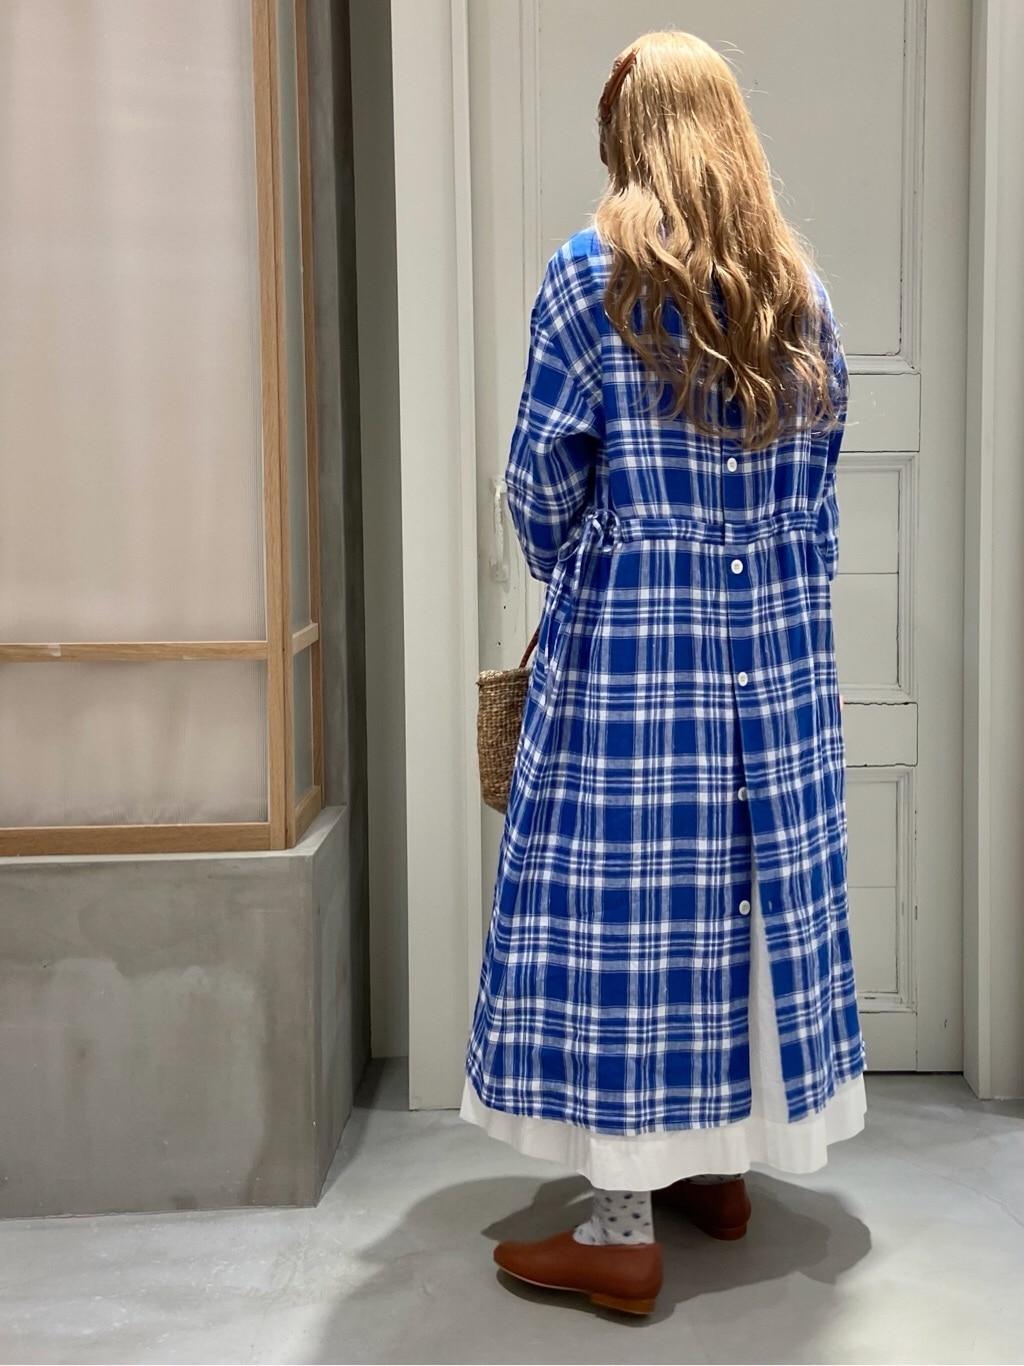 bulle de savon 渋谷スクランブルスクエア 身長:160cm 2021.03.11